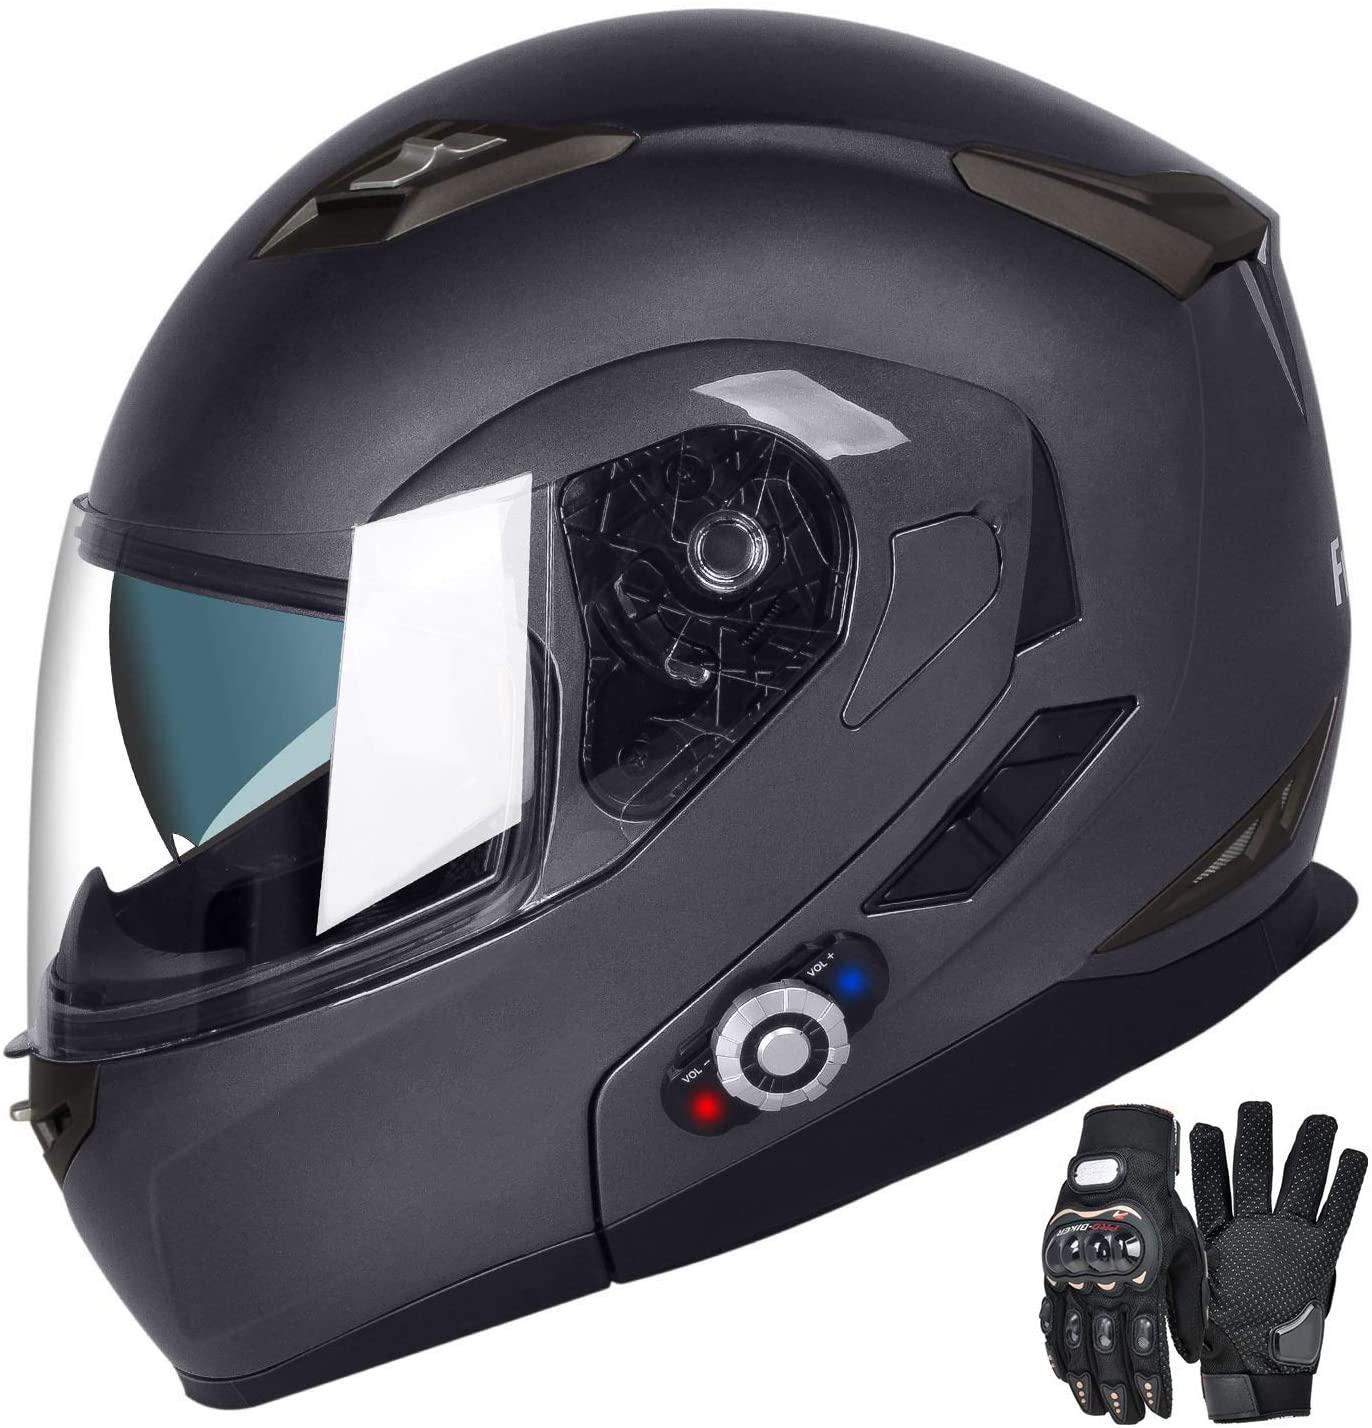 Motorcycle Bluetooth Helmets, FreedConn Flip up Dual Visors Full Face Helmet,Built-in Integrated Intercom Communication System(Range 500M,2-3Riders Pairing,FM radio,Waterproof,L,Gray)